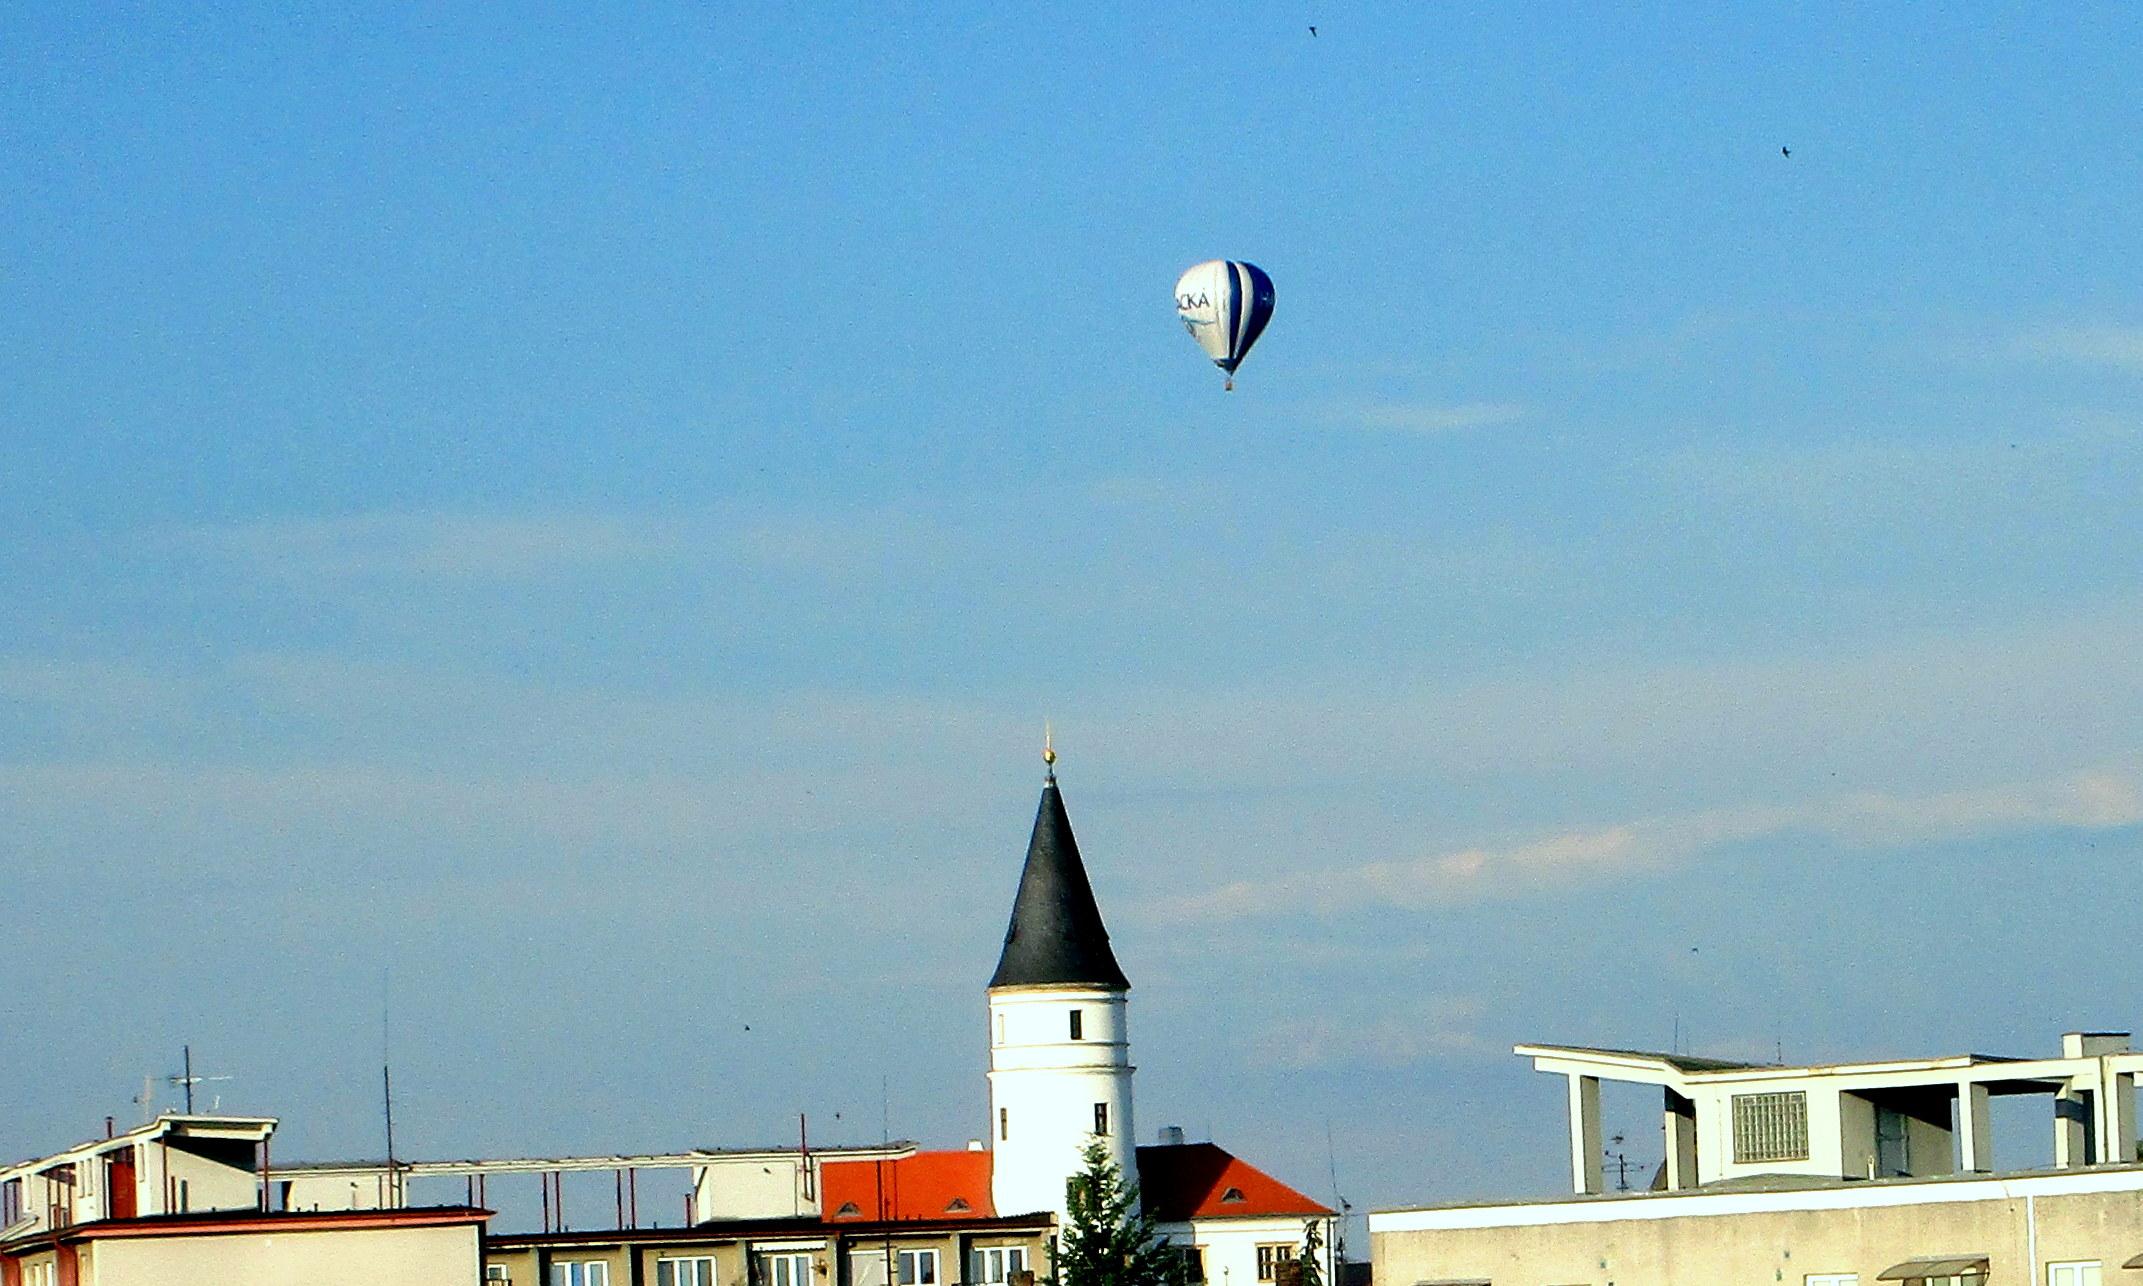 1 Přesné oko pilota balónu